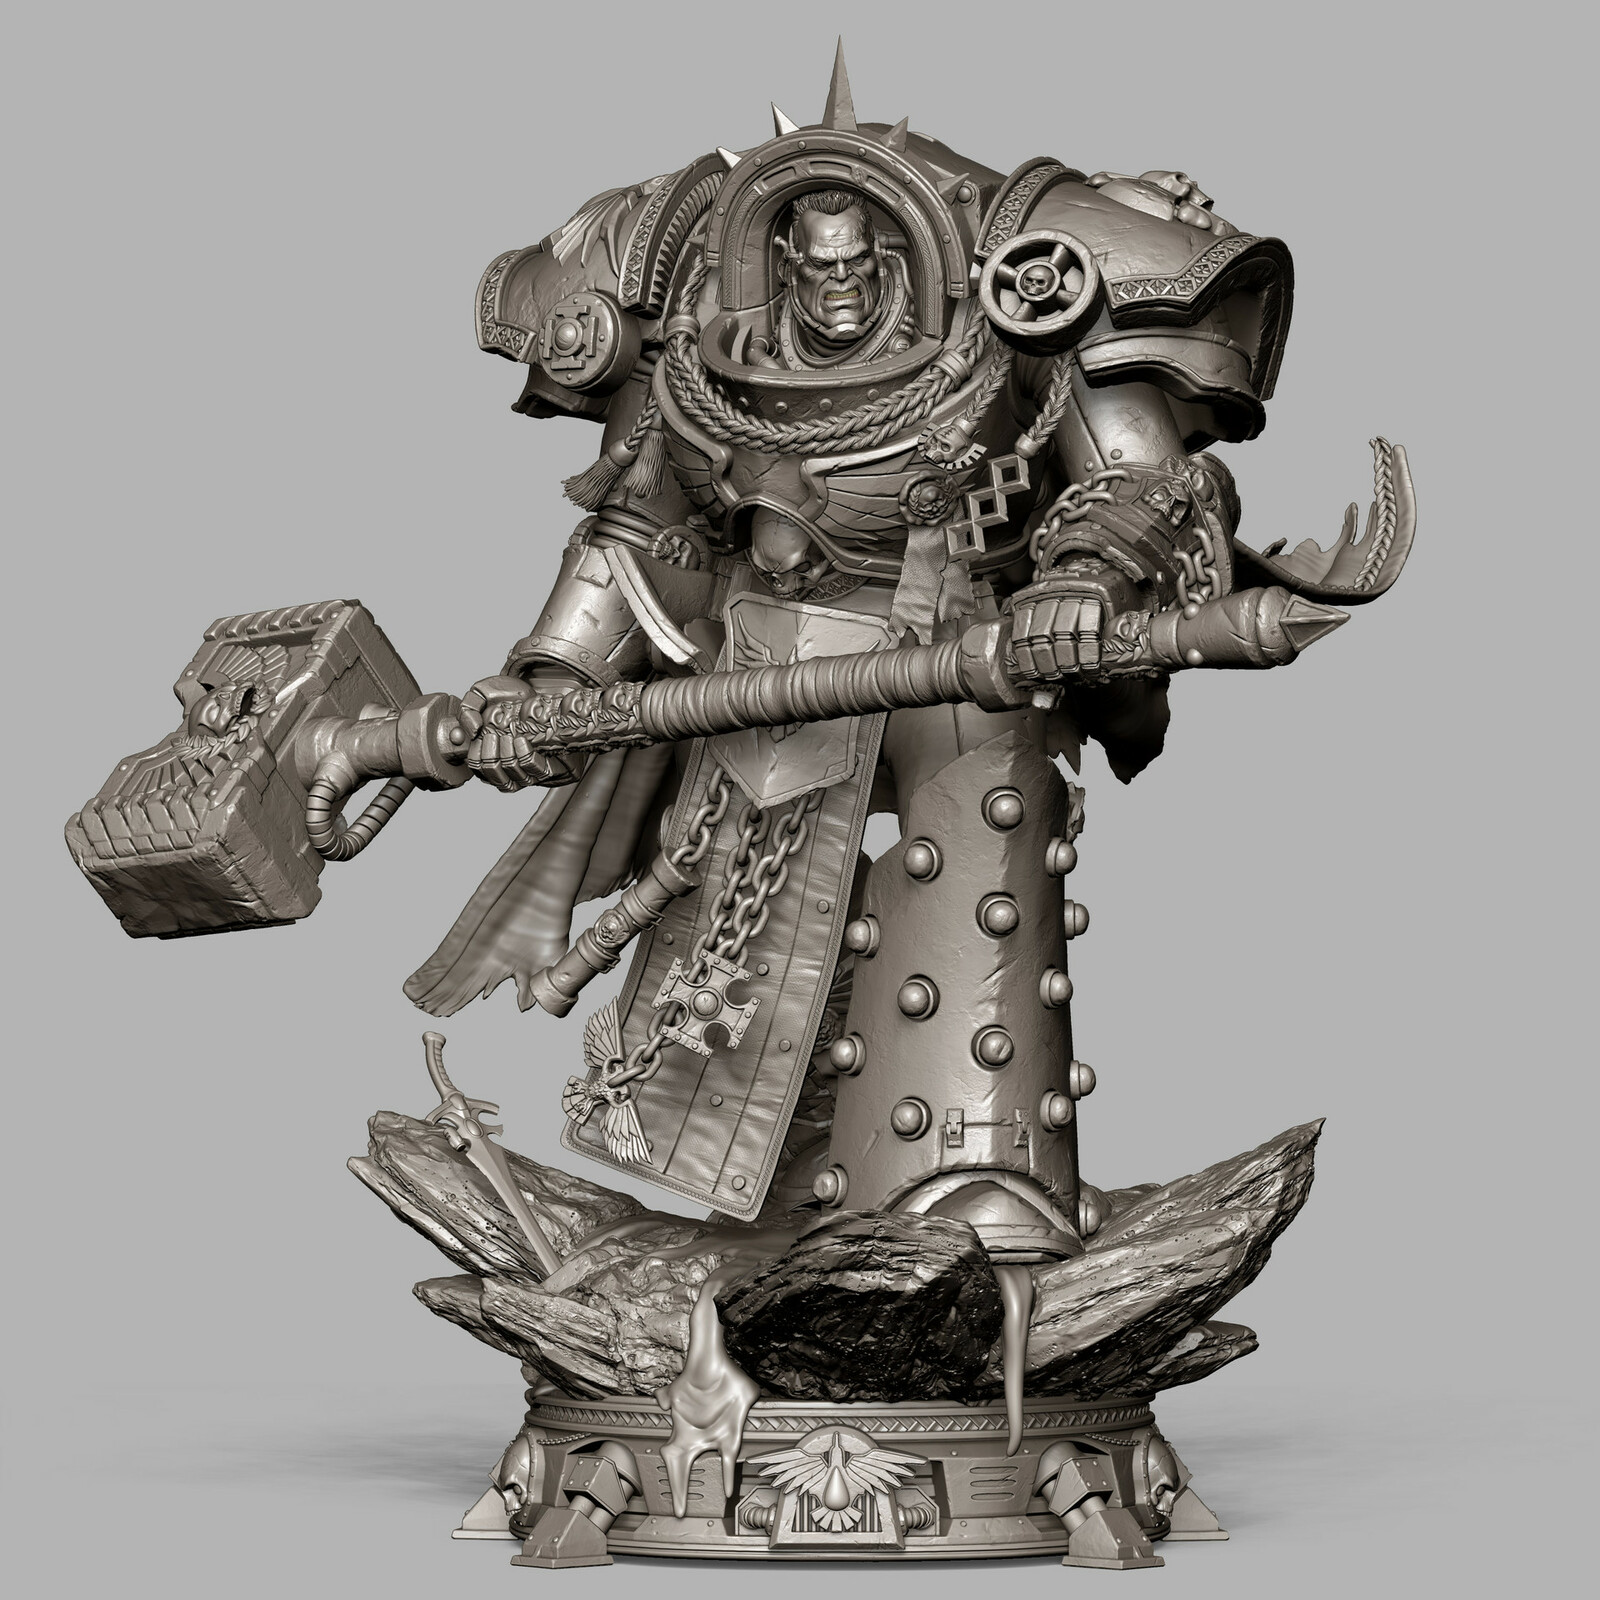 Prime1 Studio - Warhammer 40k Gabriel Angelos 1:4 Scale